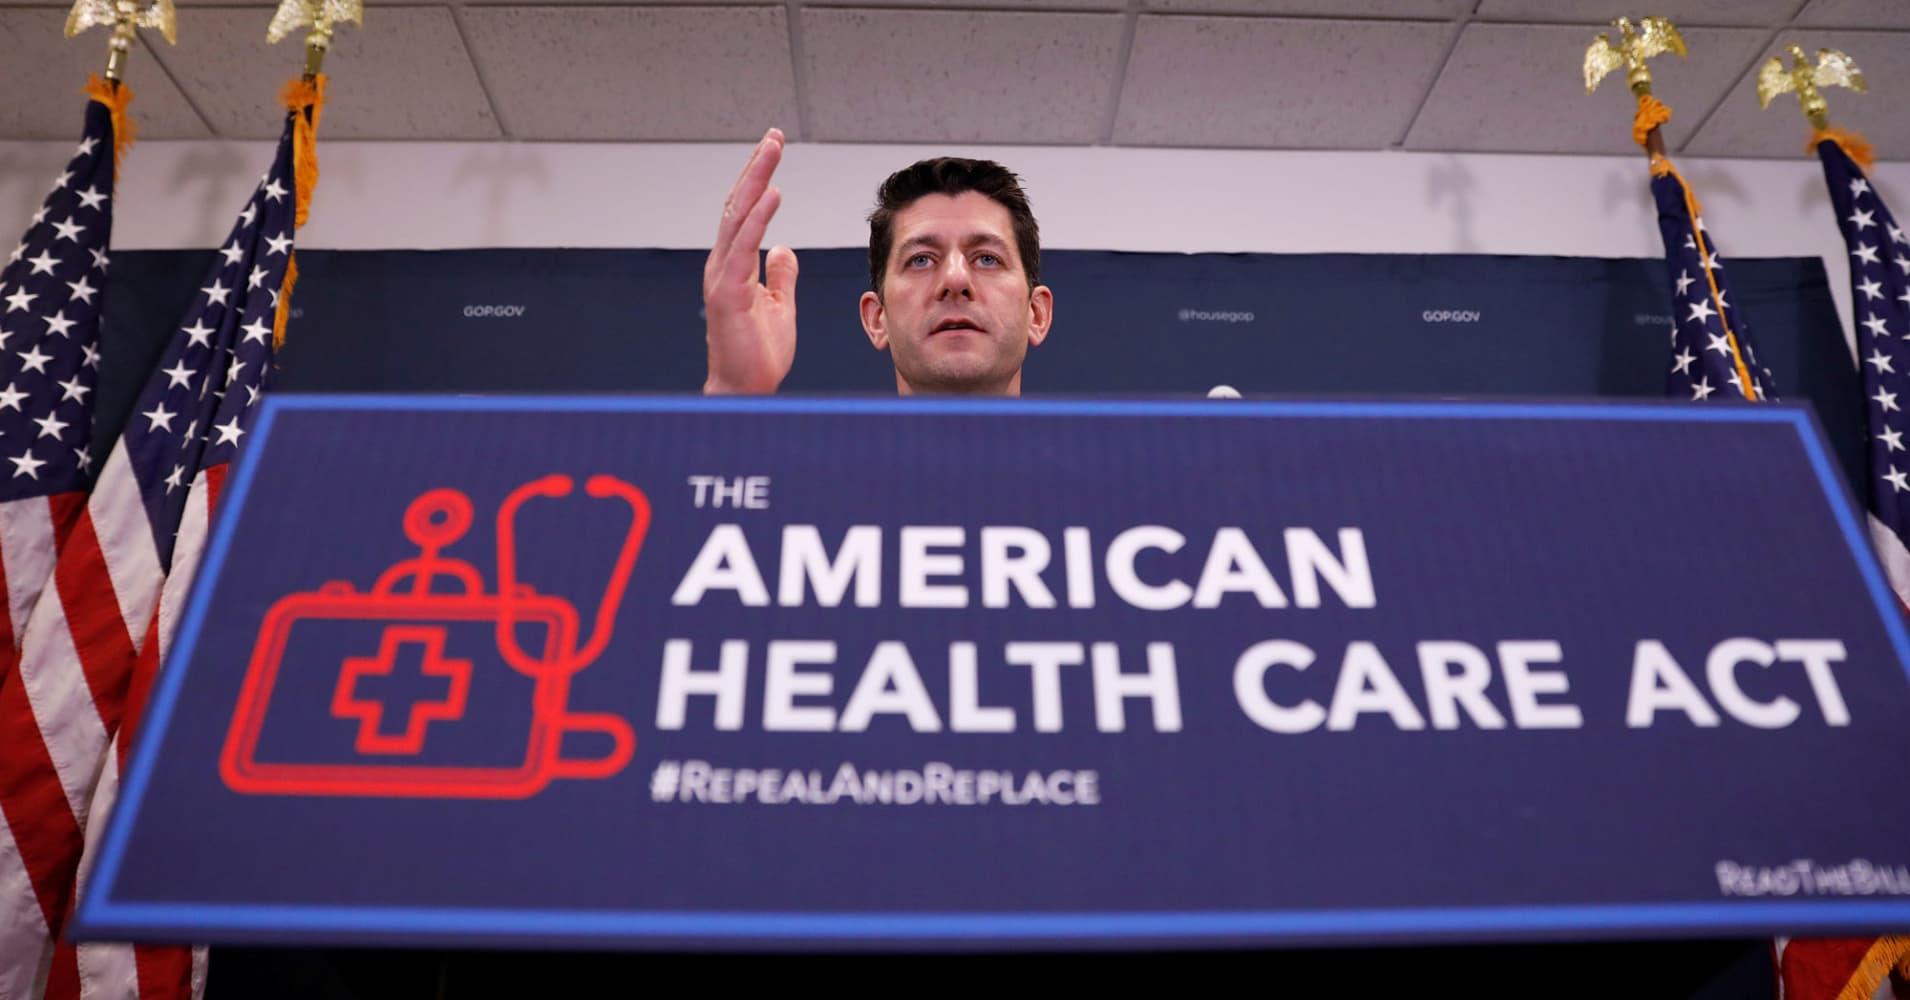 Op-Ed: Paul Ryan's office is gaslighting America on the health-care bill